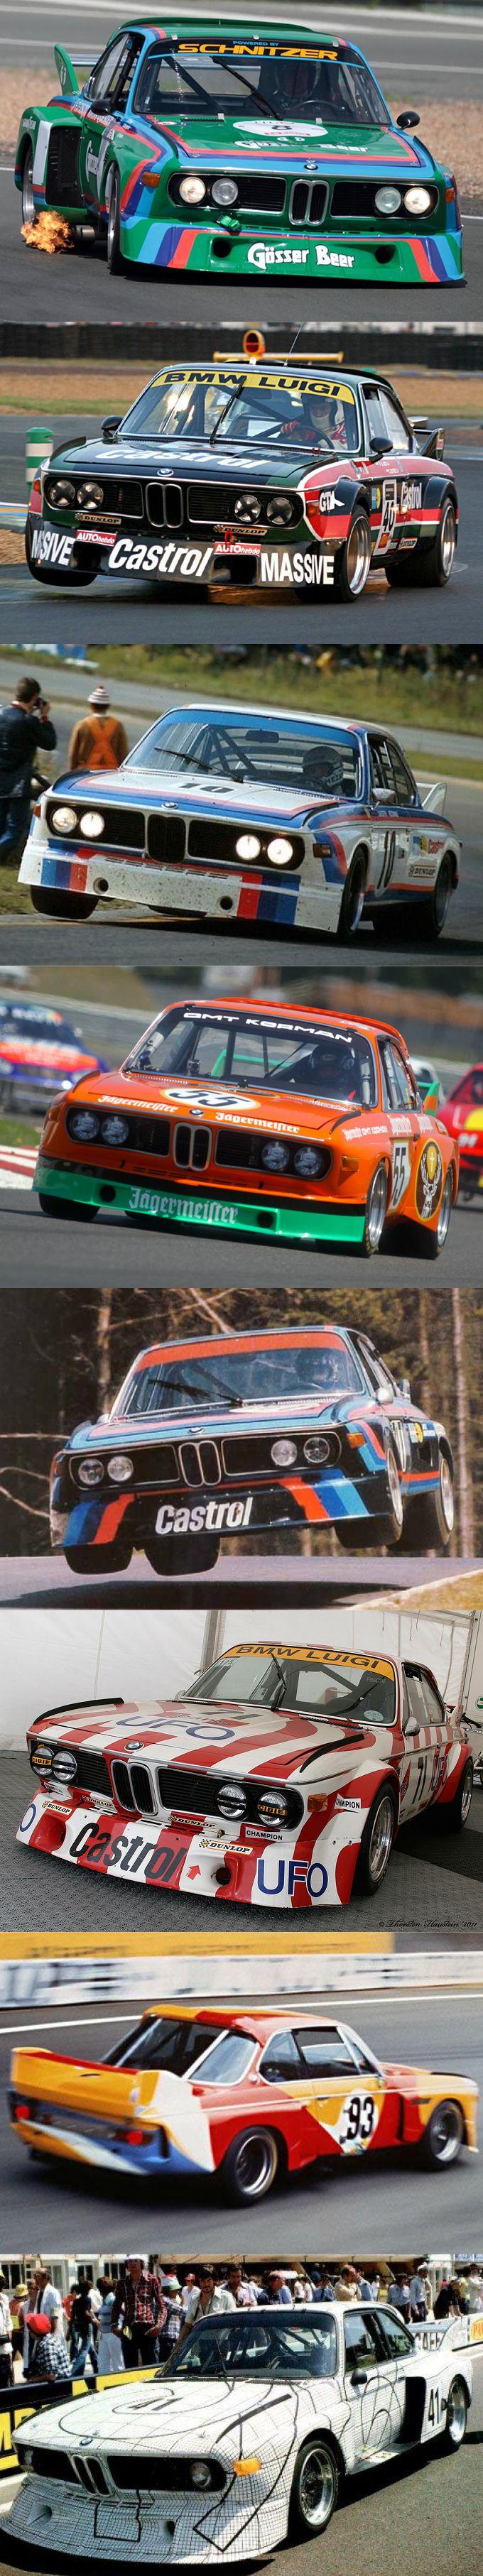 1973 BMW CSL group 5 liveries / 'Batmobile' / Gösser Beer / Luigi Castrol / Motorsport /  Jägermeister / Castrol / Luigi / Calder / Stella / Germany